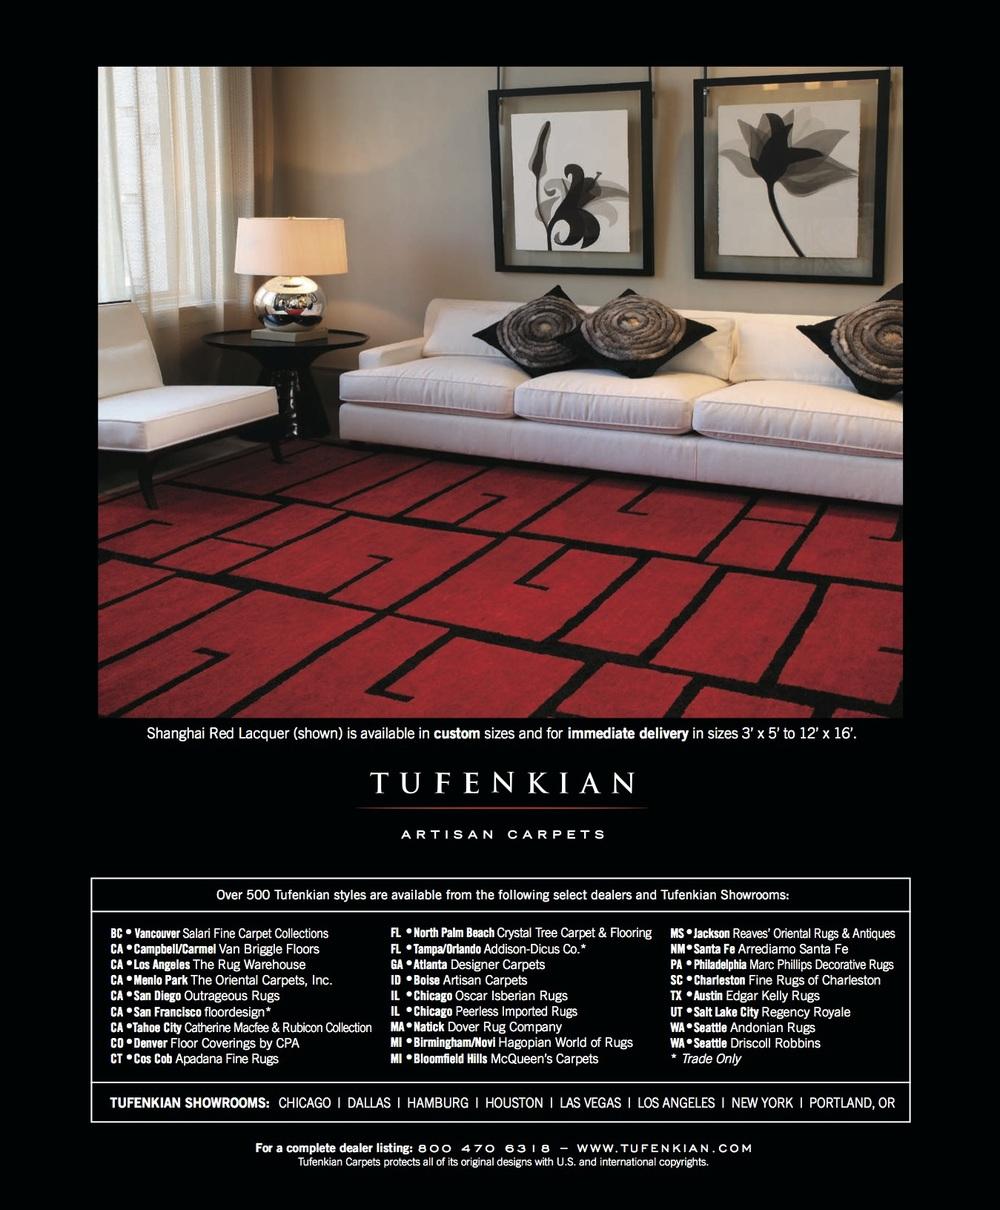 Aramazt Kalayjian Works Tufenkian Artisan Carpets Marketing Materials